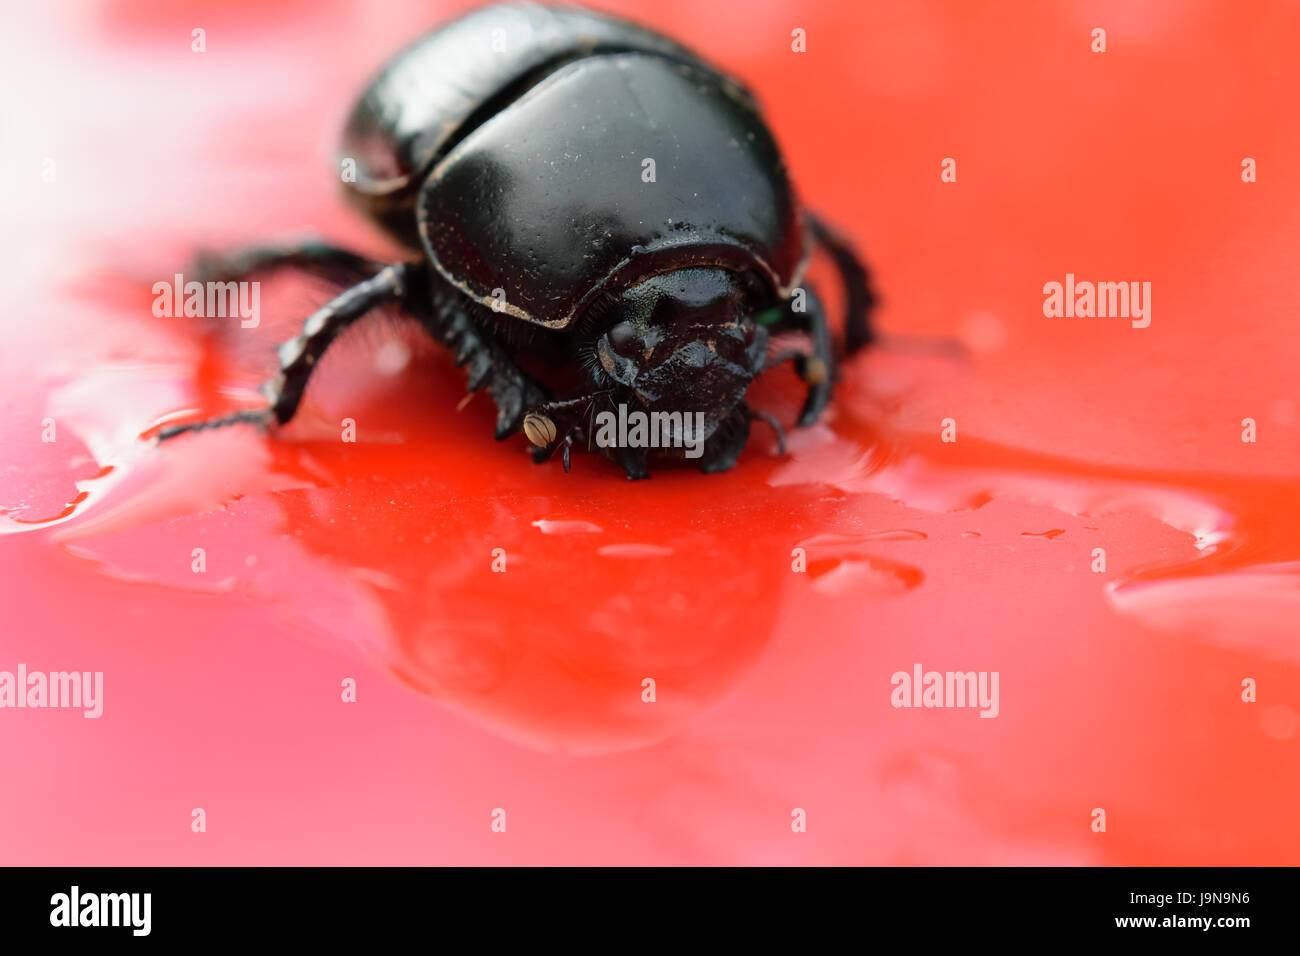 Nahaufnahme des Käfers Dor / Dumbledore Dung Beetle Stockbild